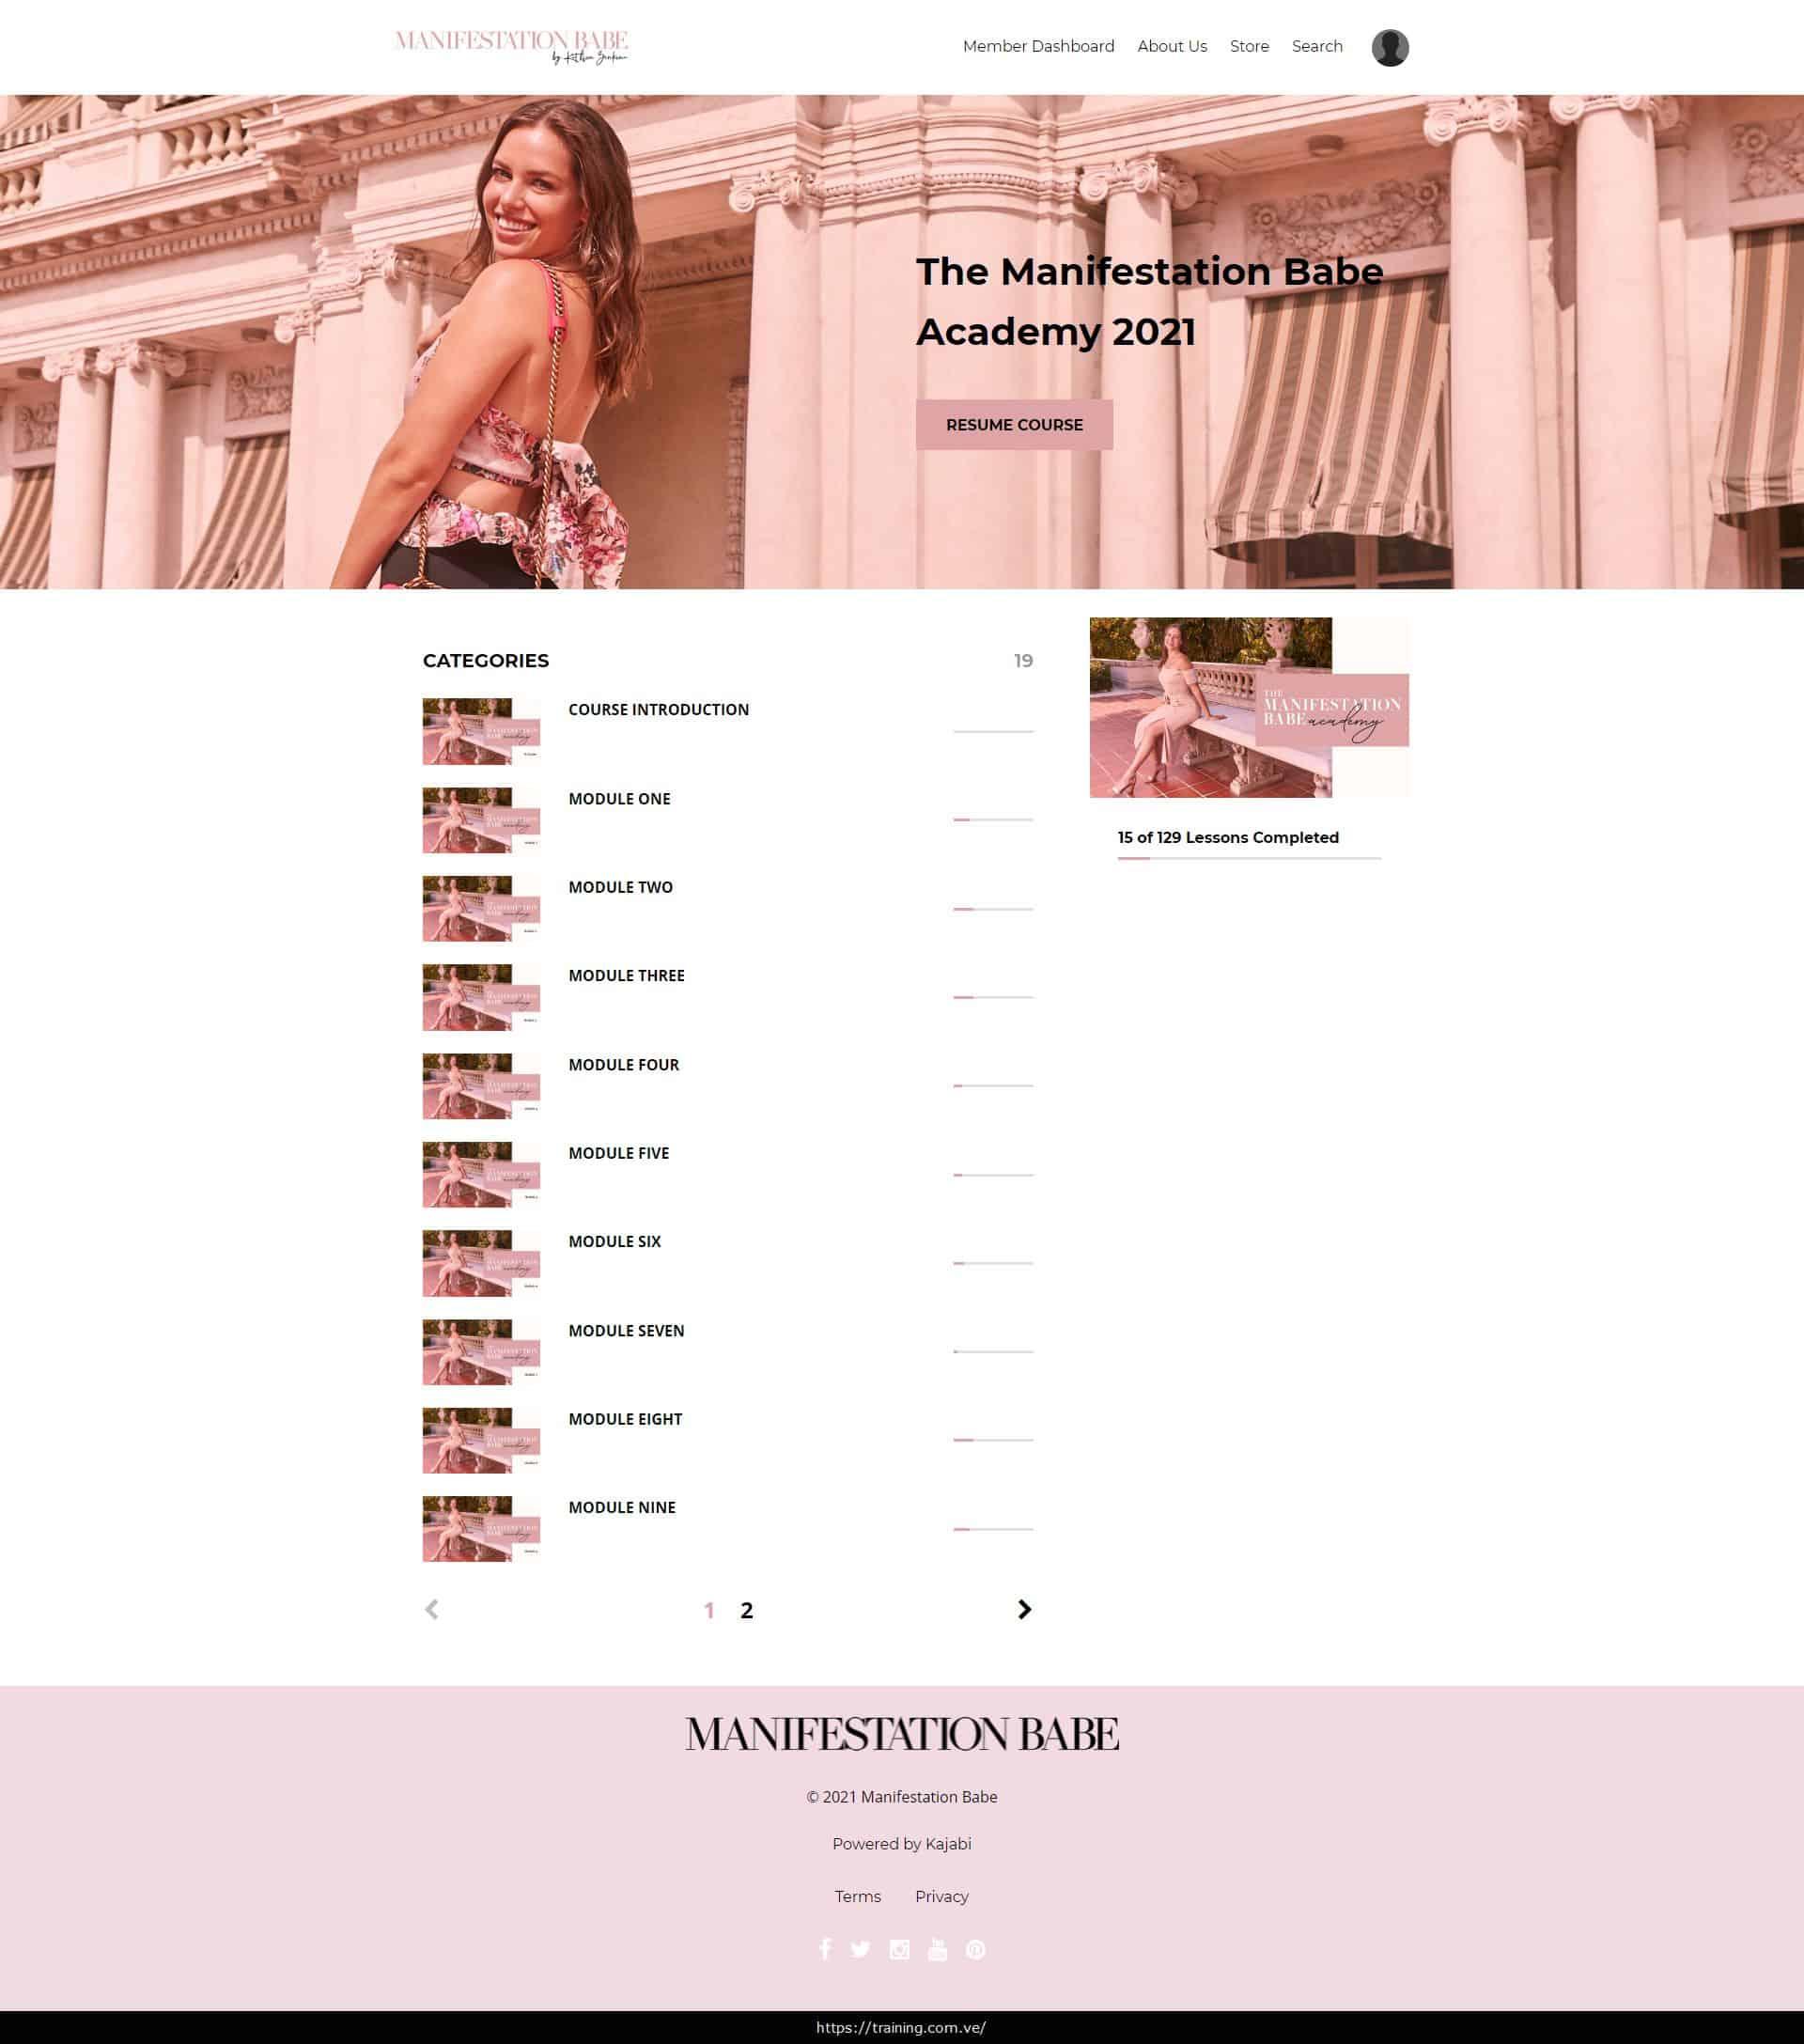 Manifestation Babe Academy 2021 by Kathrin Zenkina Download